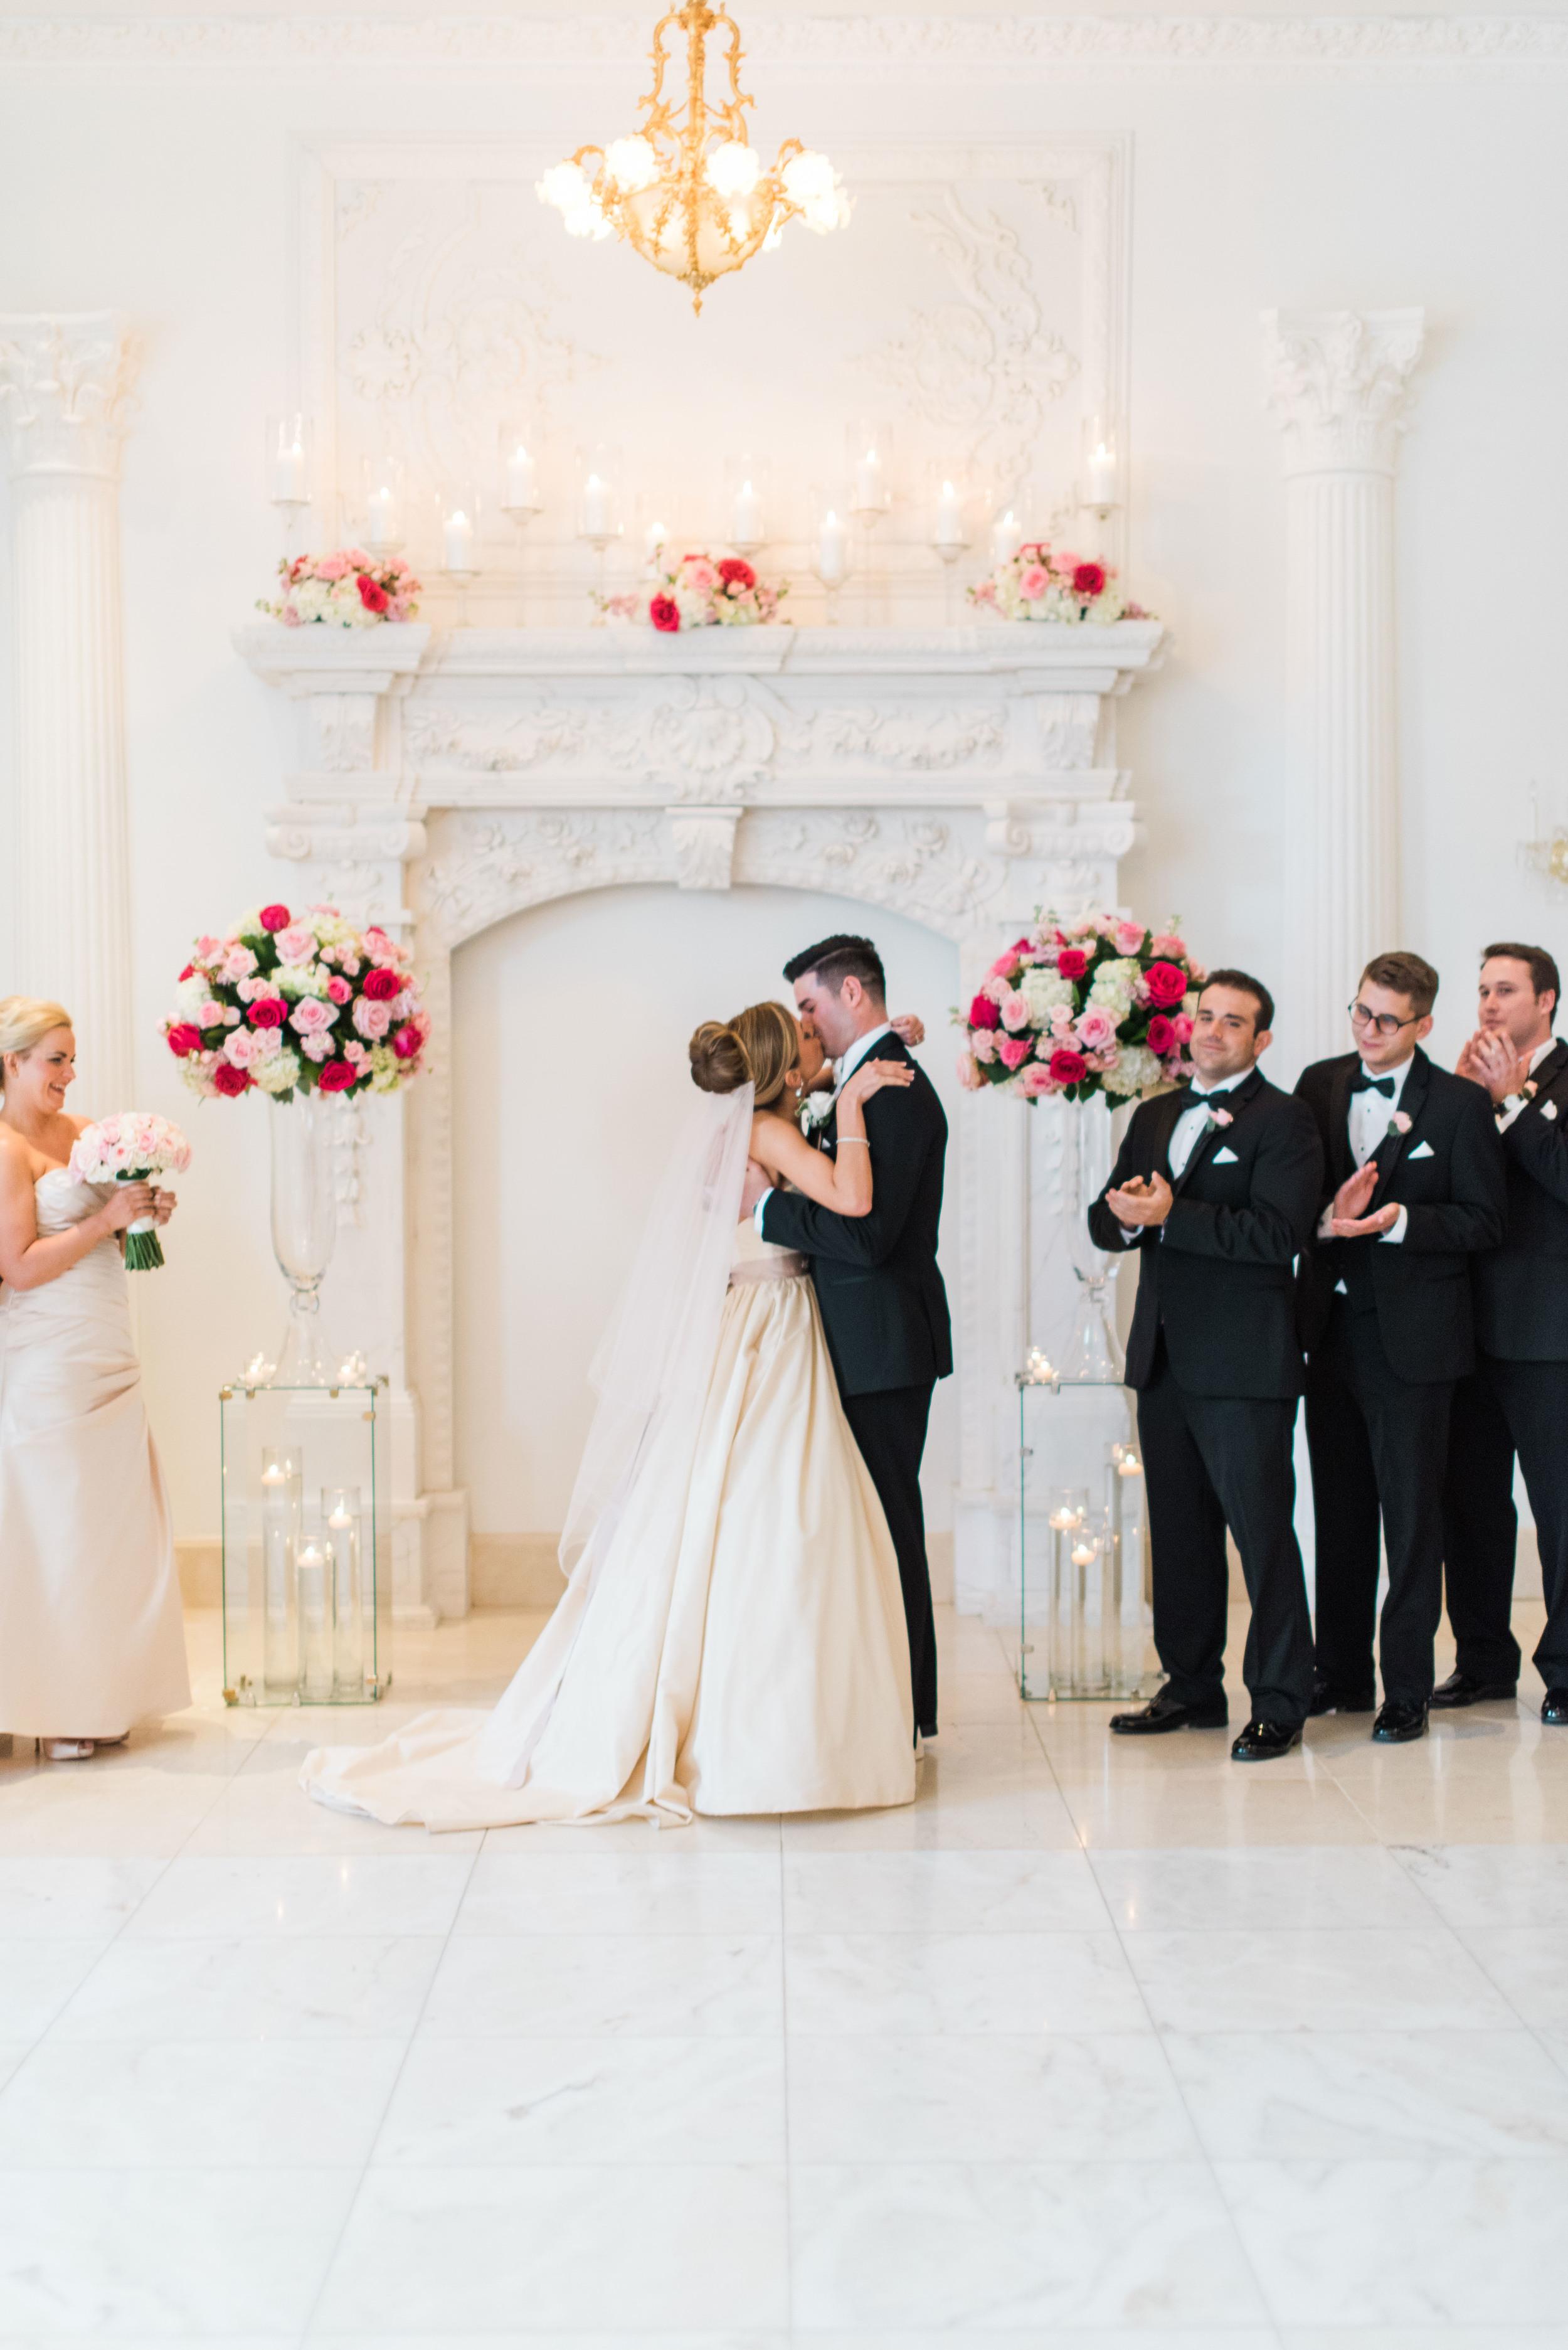 Dana-Fernandez-Photography-Houston-Wedding-Photographer-Style-Me-Pretty-Film-Texas-Destination-Photographer-15.jpg